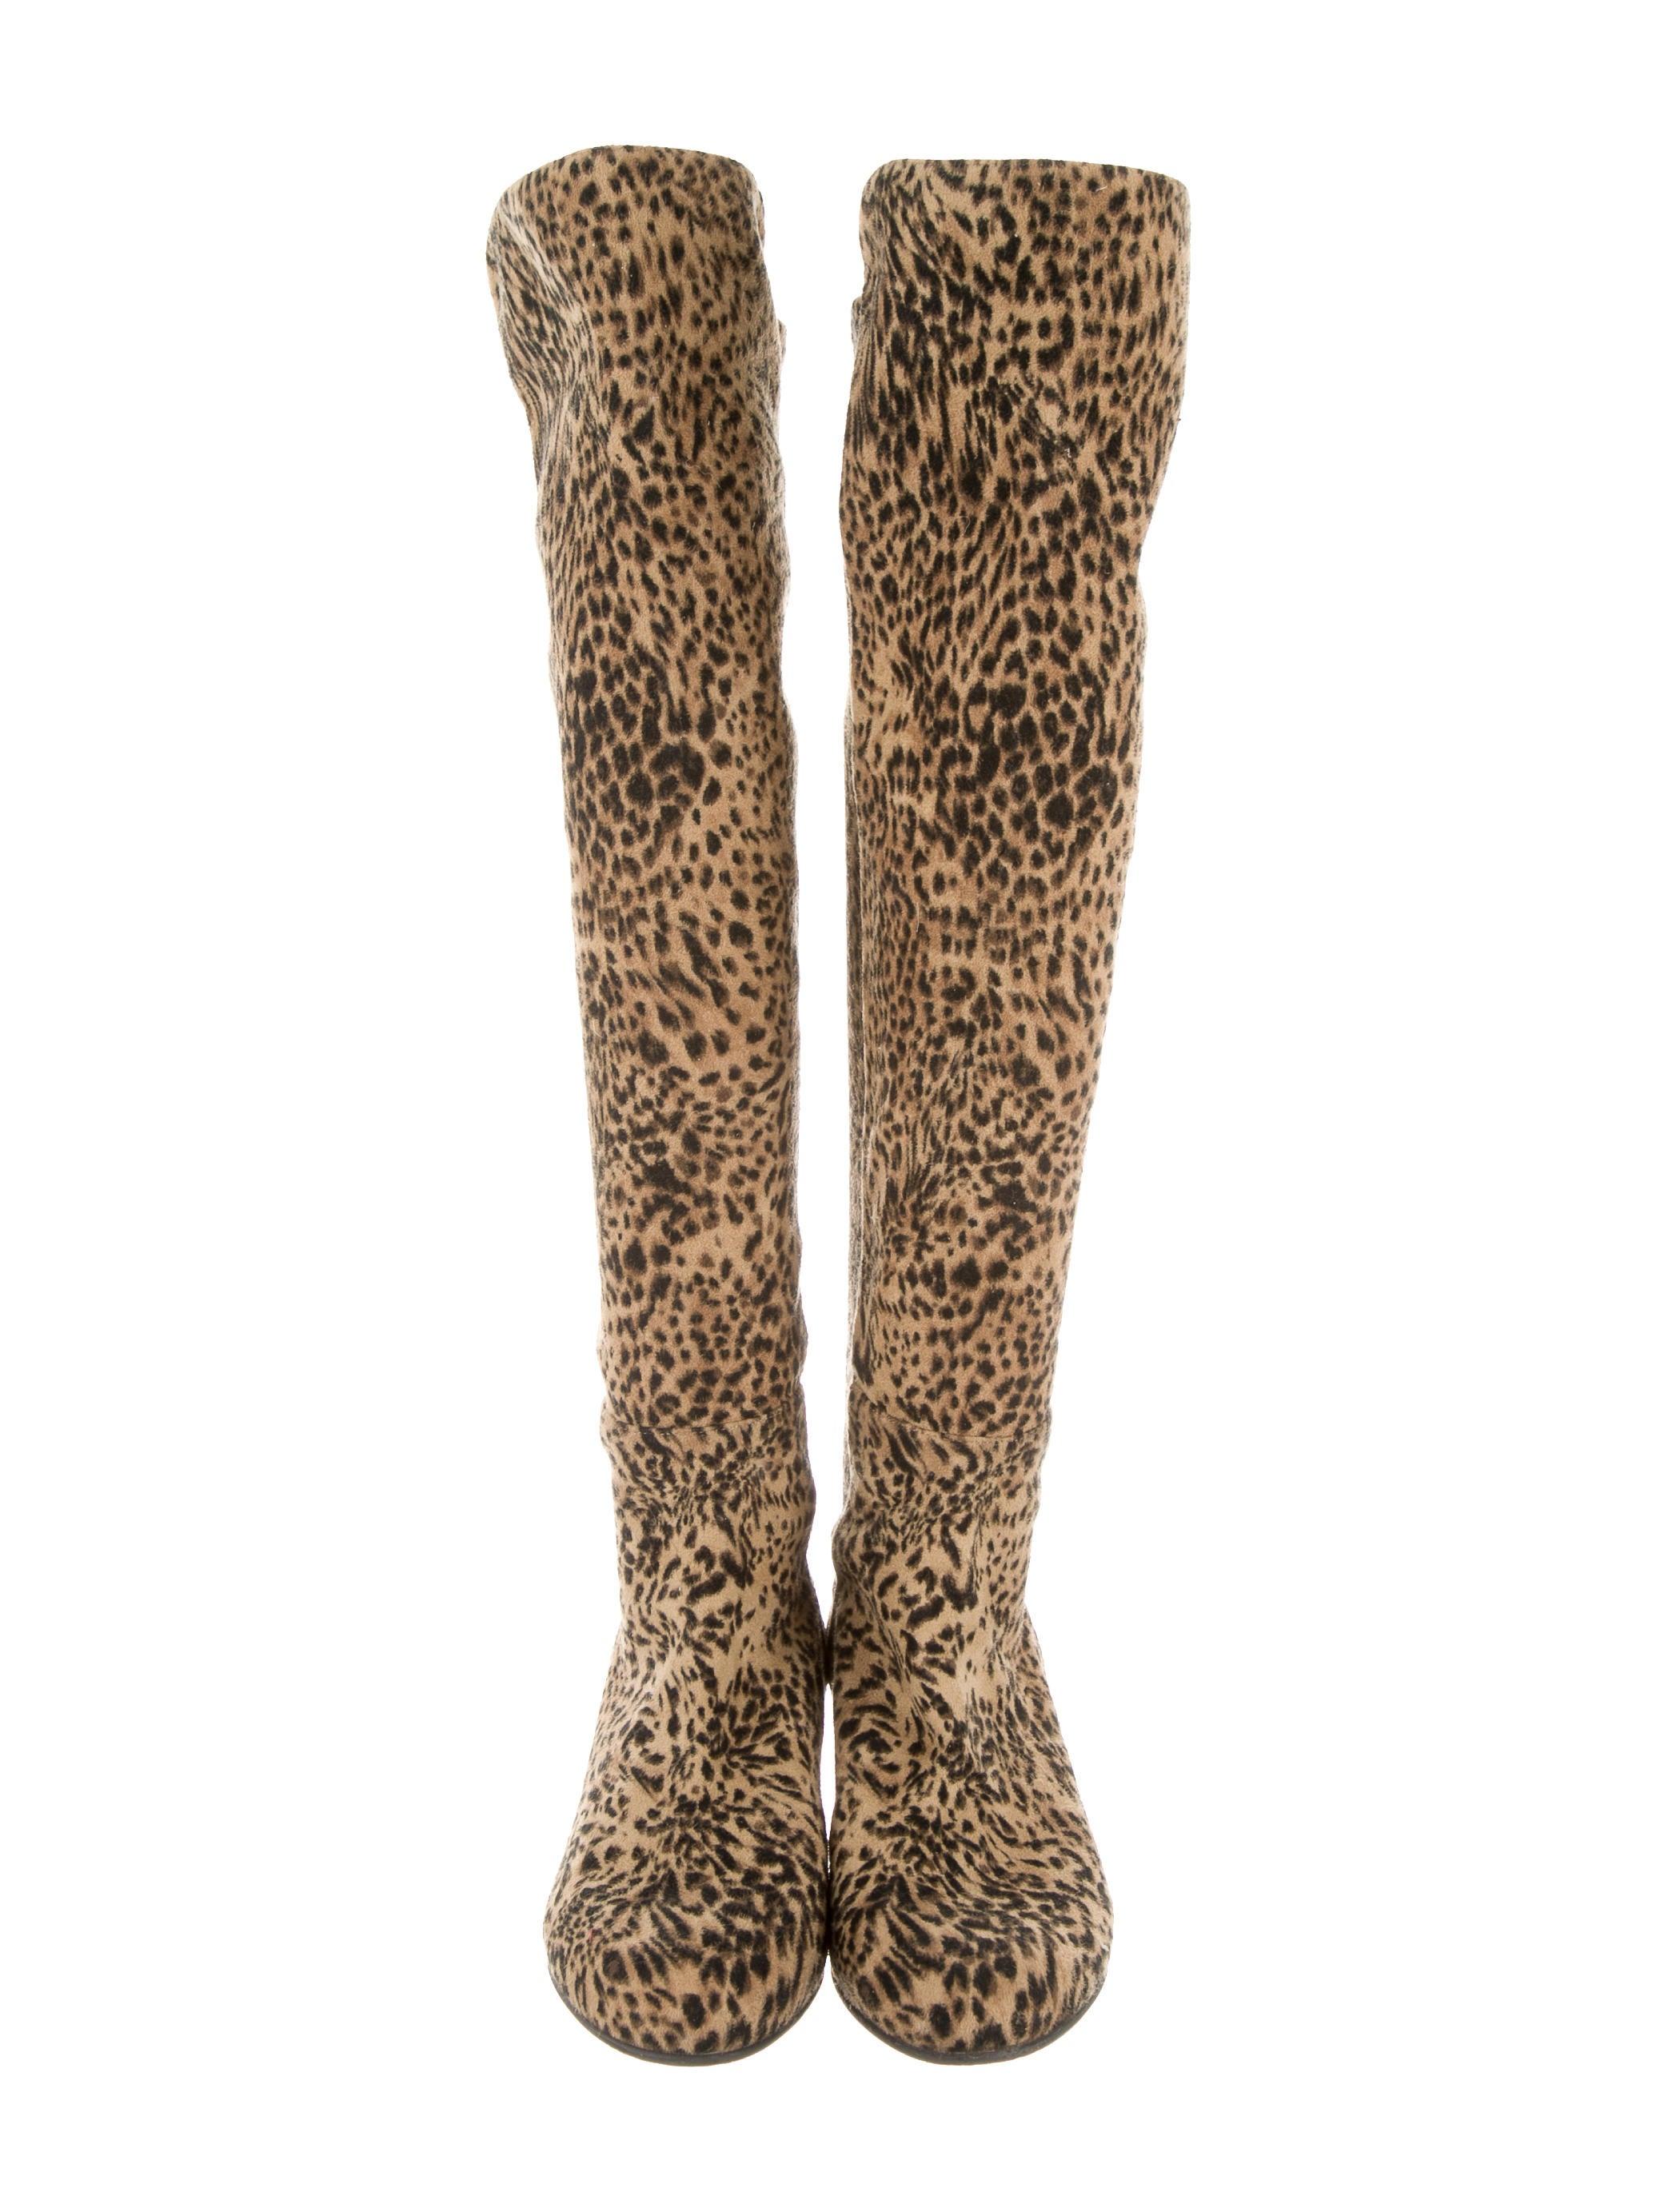 stuart weitzman suede leopard boots shoes wsu23963